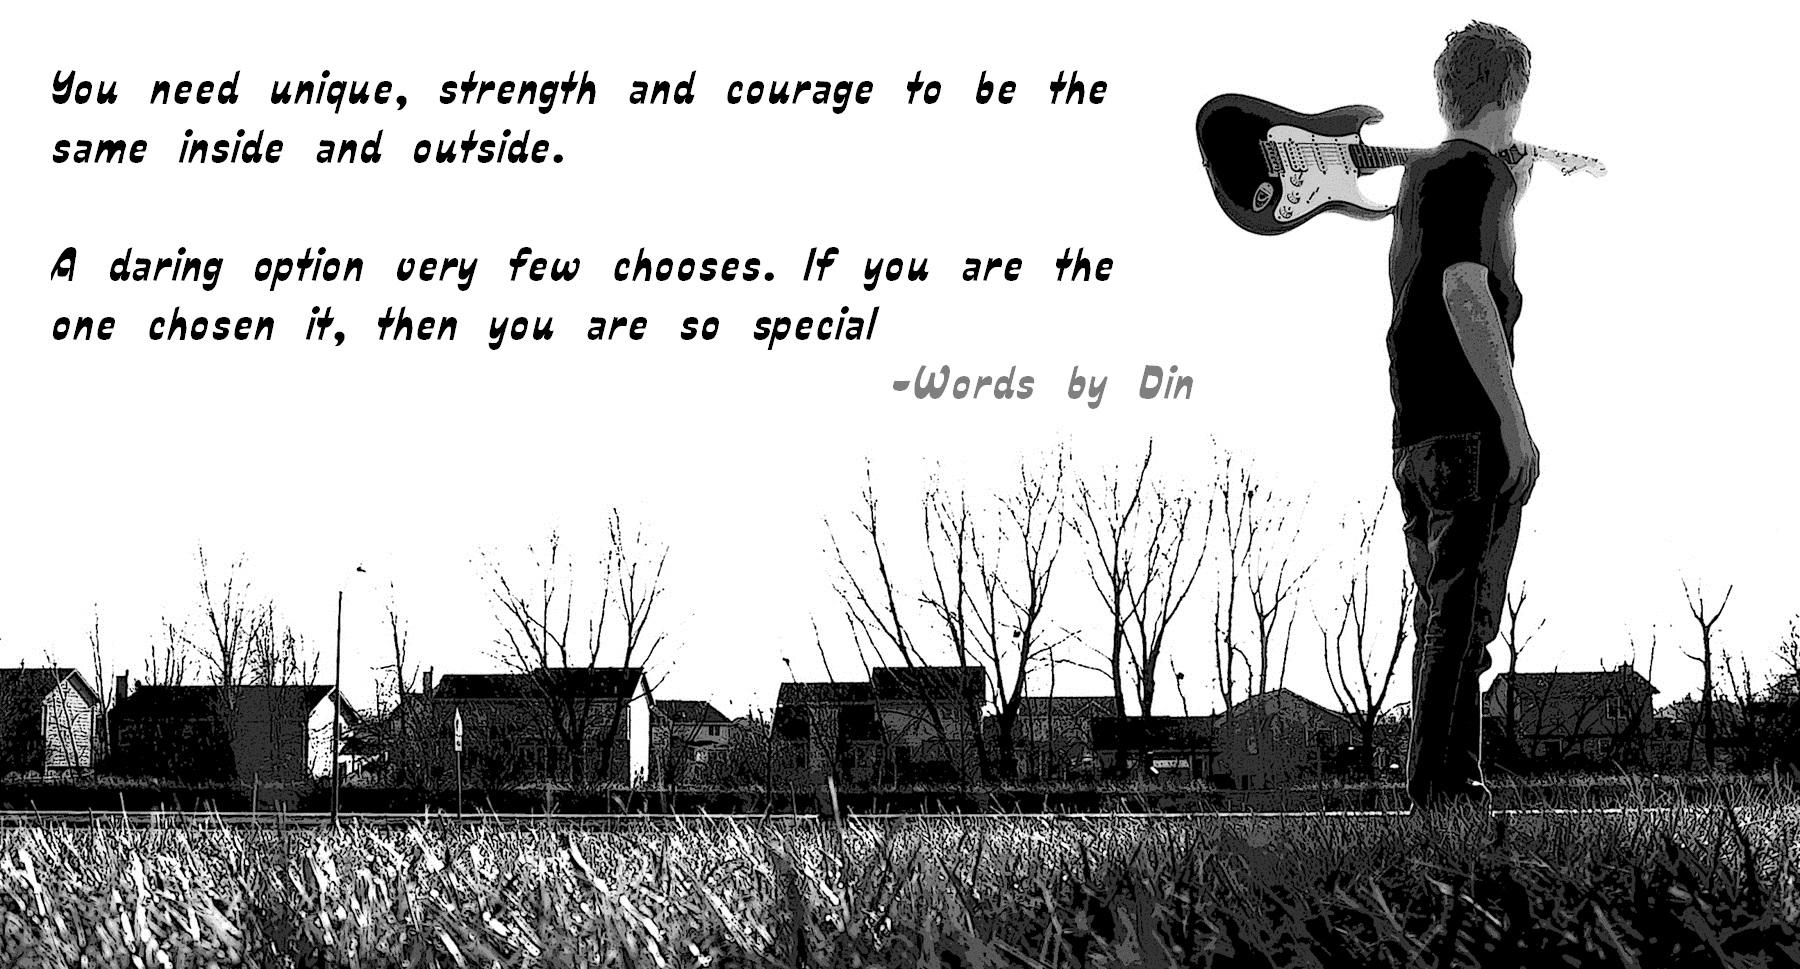 Unique Quotes About Strength